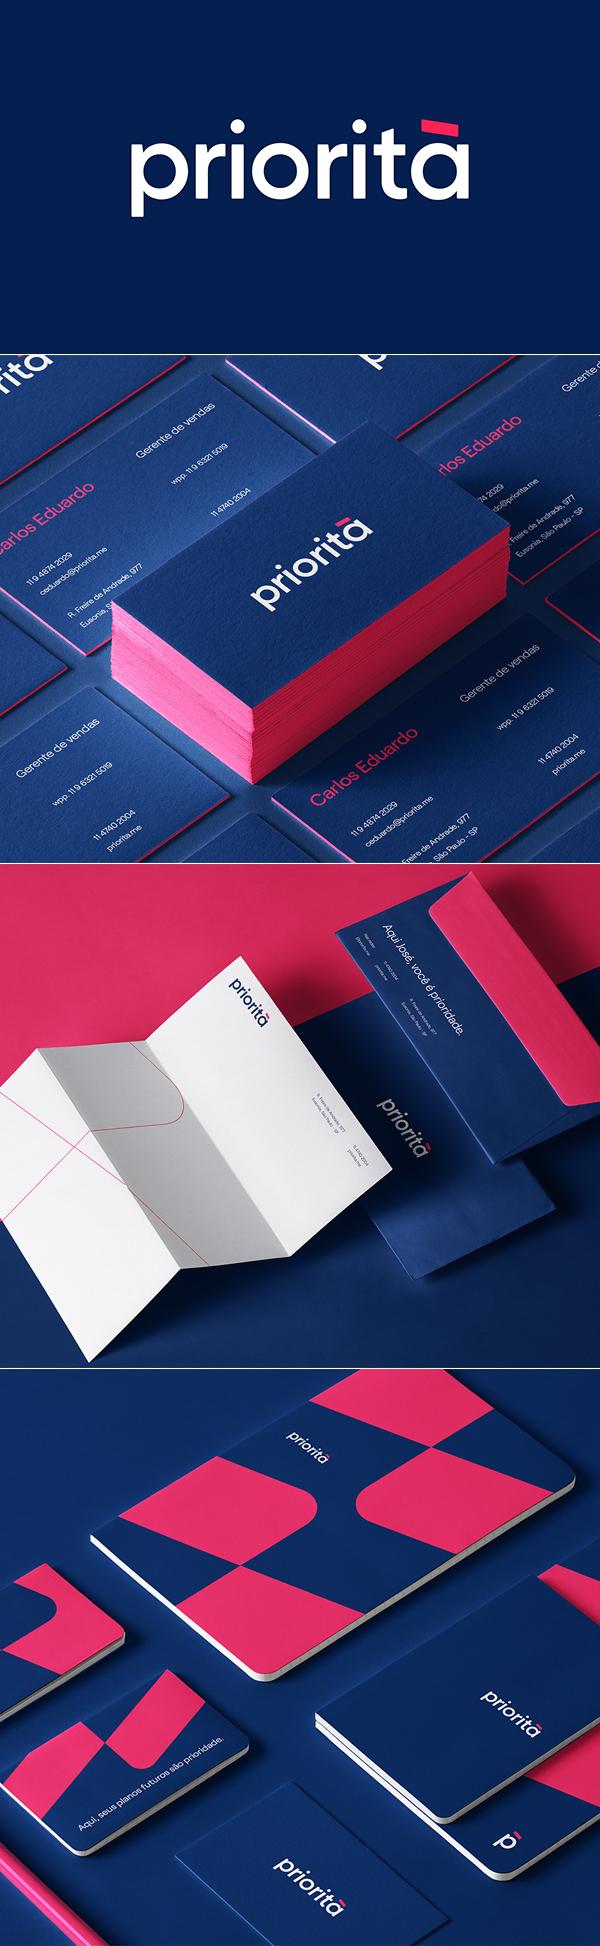 Priorita Joao Branding Identity by Marcos